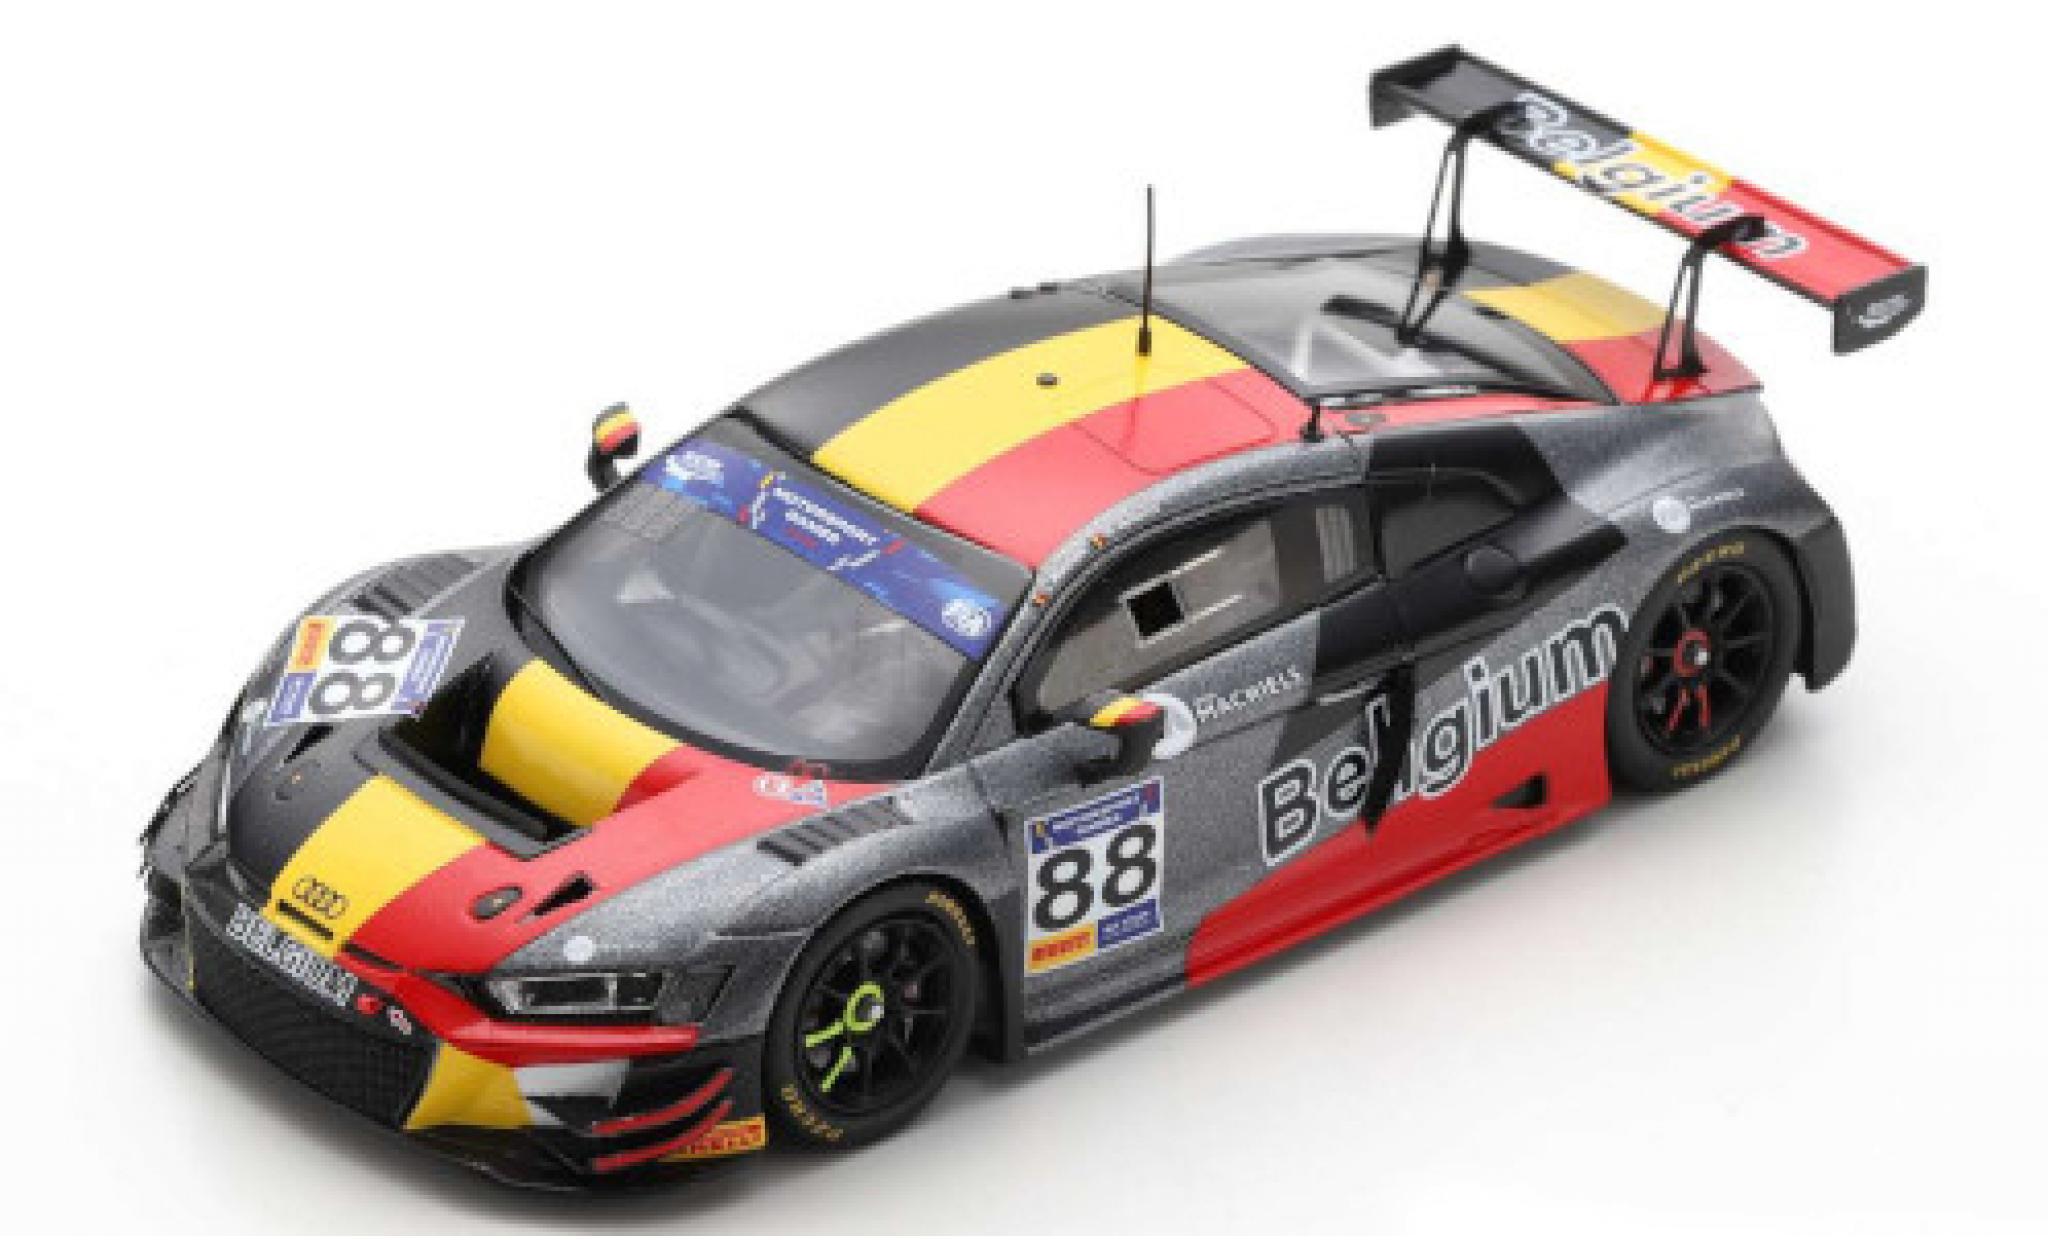 Audi R8 1/43 Spark LMS GT3 No.88 Team Belgium FIA Motorsport Games GT Cup Vallelunga 2019 L.Machiels/N.Verdonck